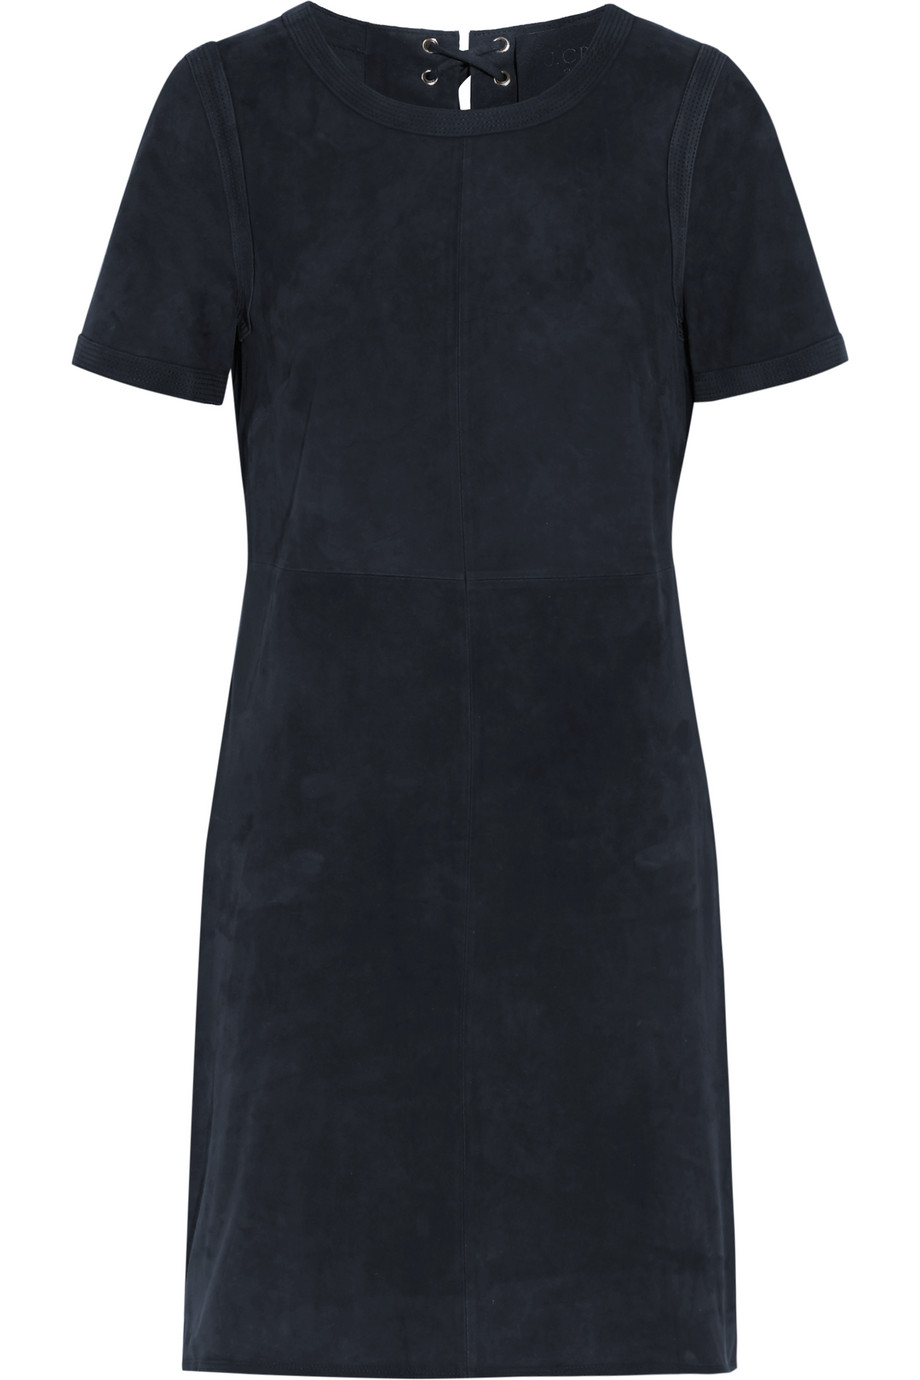 J.Crew Collection Dayton Suede Mini Dress, Navy, Women's, Size: 4